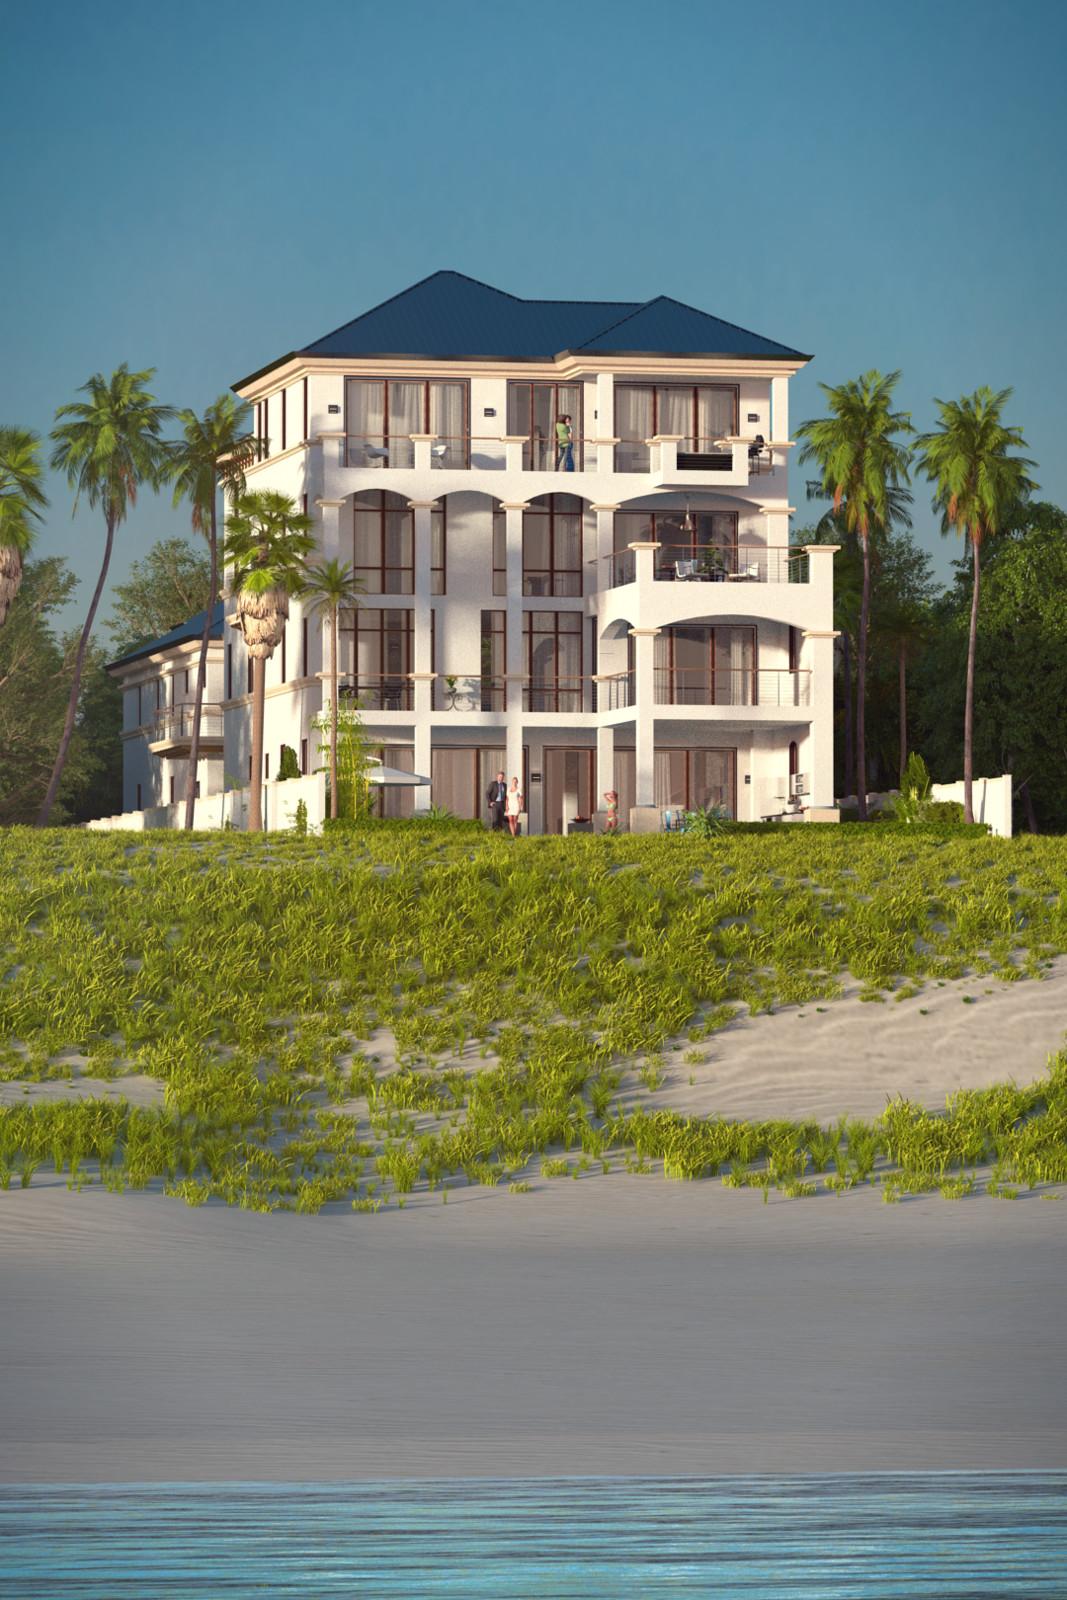 SketchUp + Thea Render  Seagrove Beach House: From Water 02 C Lumina Rise 1080 × 1620 Presto MC Bucket